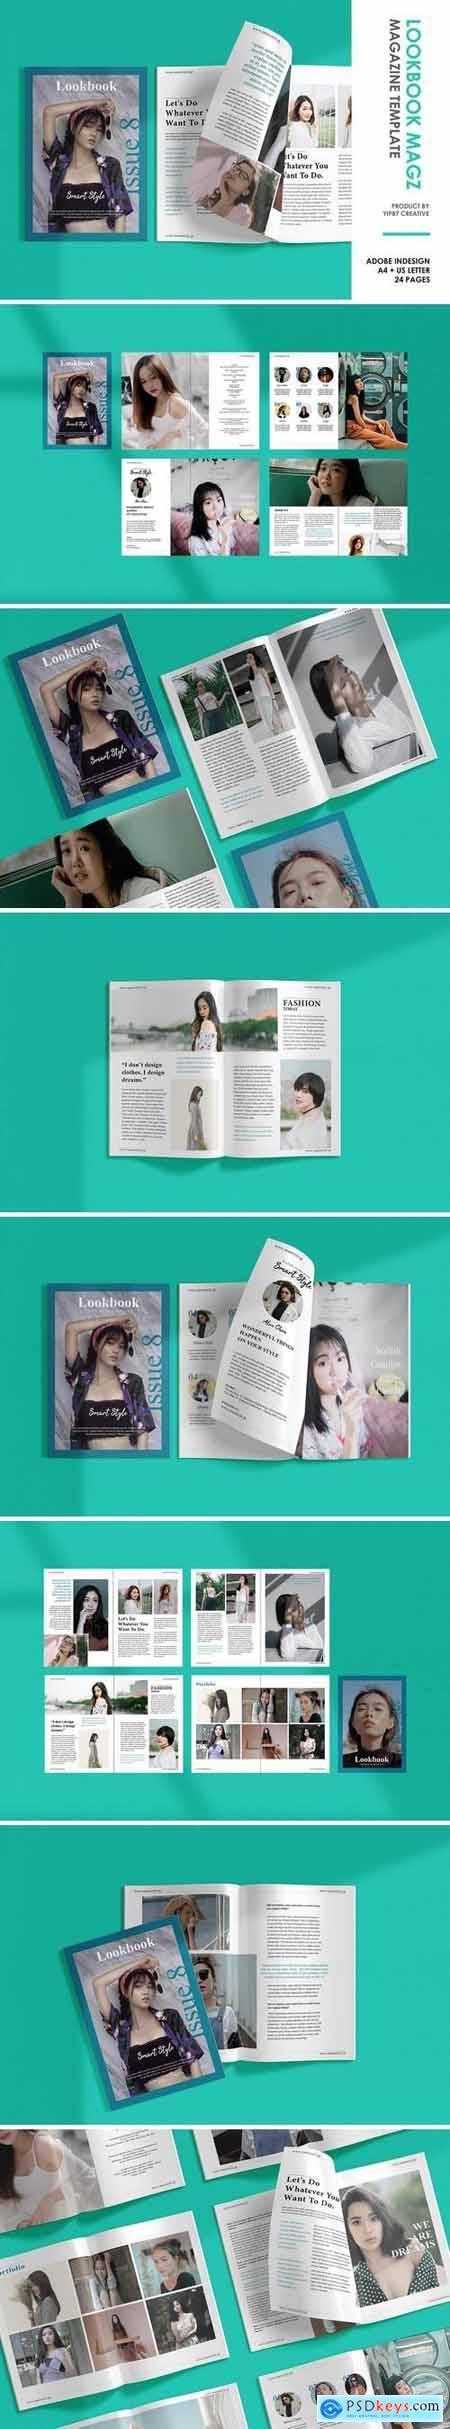 Lookbook - Fashion Magazine